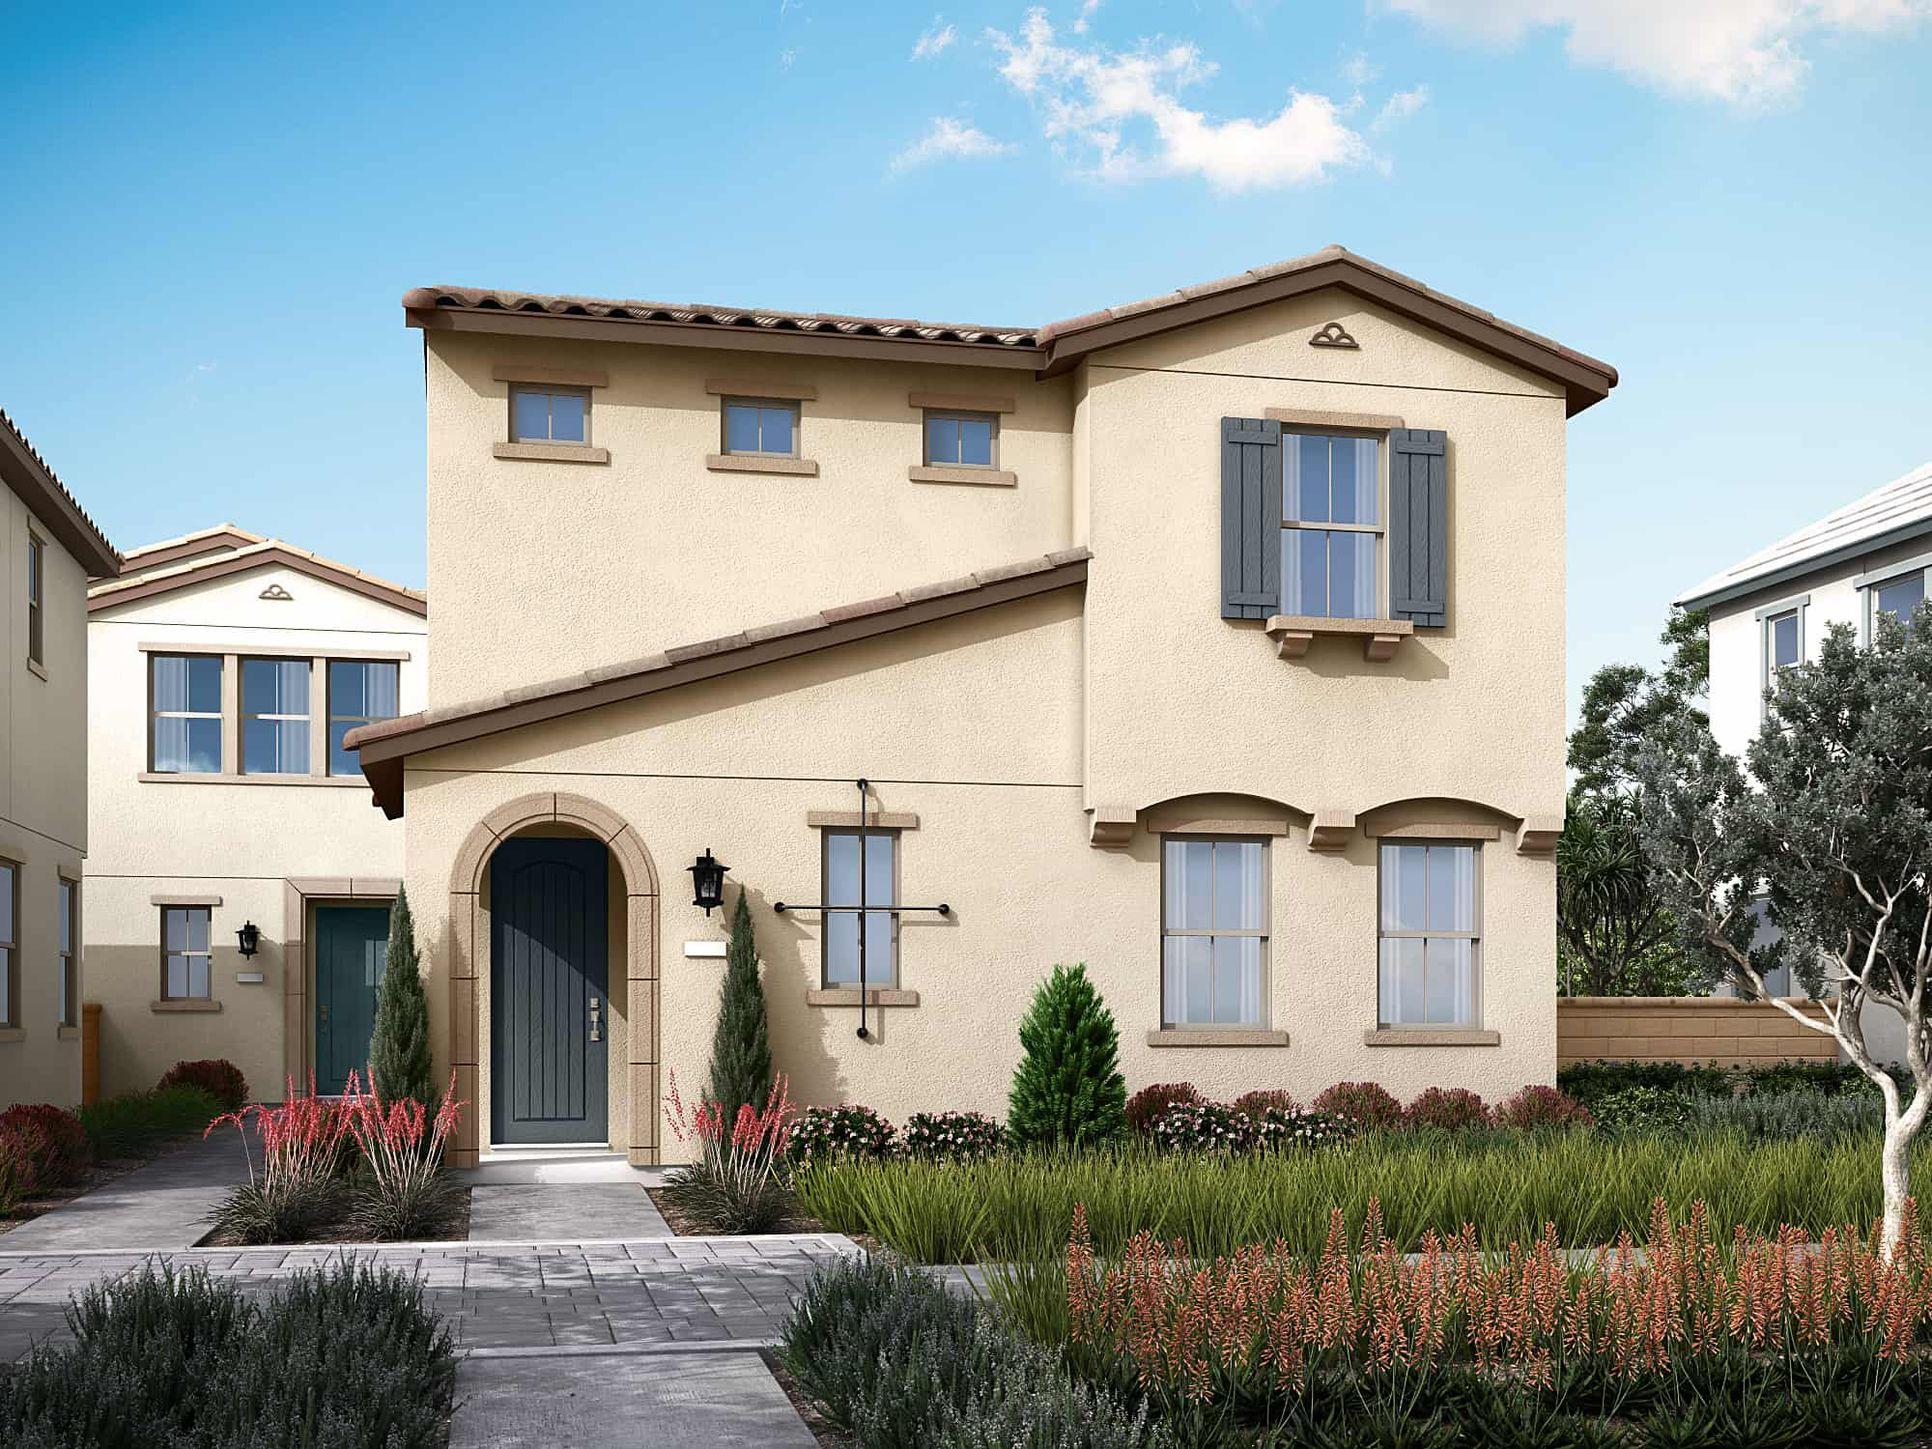 Delia Plan 2A:Spanish Colonial Exterior Style | Preliminary Rendering